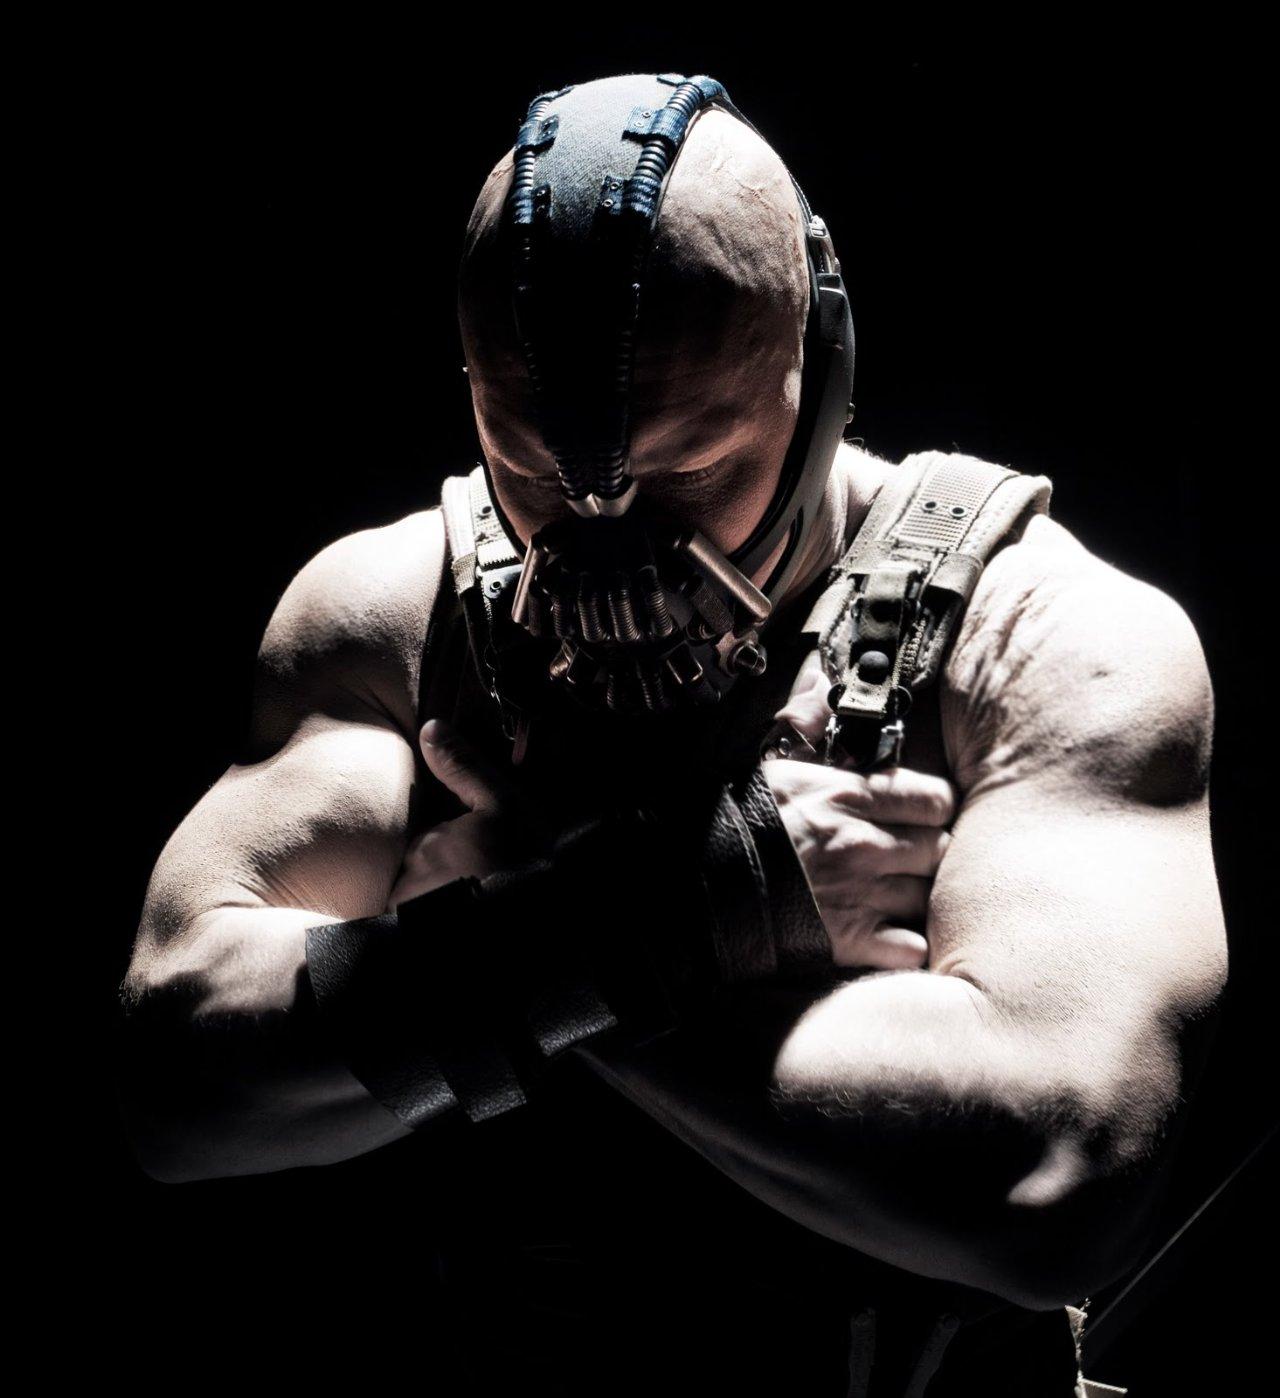 http://2.bp.blogspot.com/--nlufpUUEDg/Tvde2ydCZgI/AAAAAAAAApA/VDL7qSPSFPk/s1600/The+Dark+Knight+Rises-New-Images-3.jpg